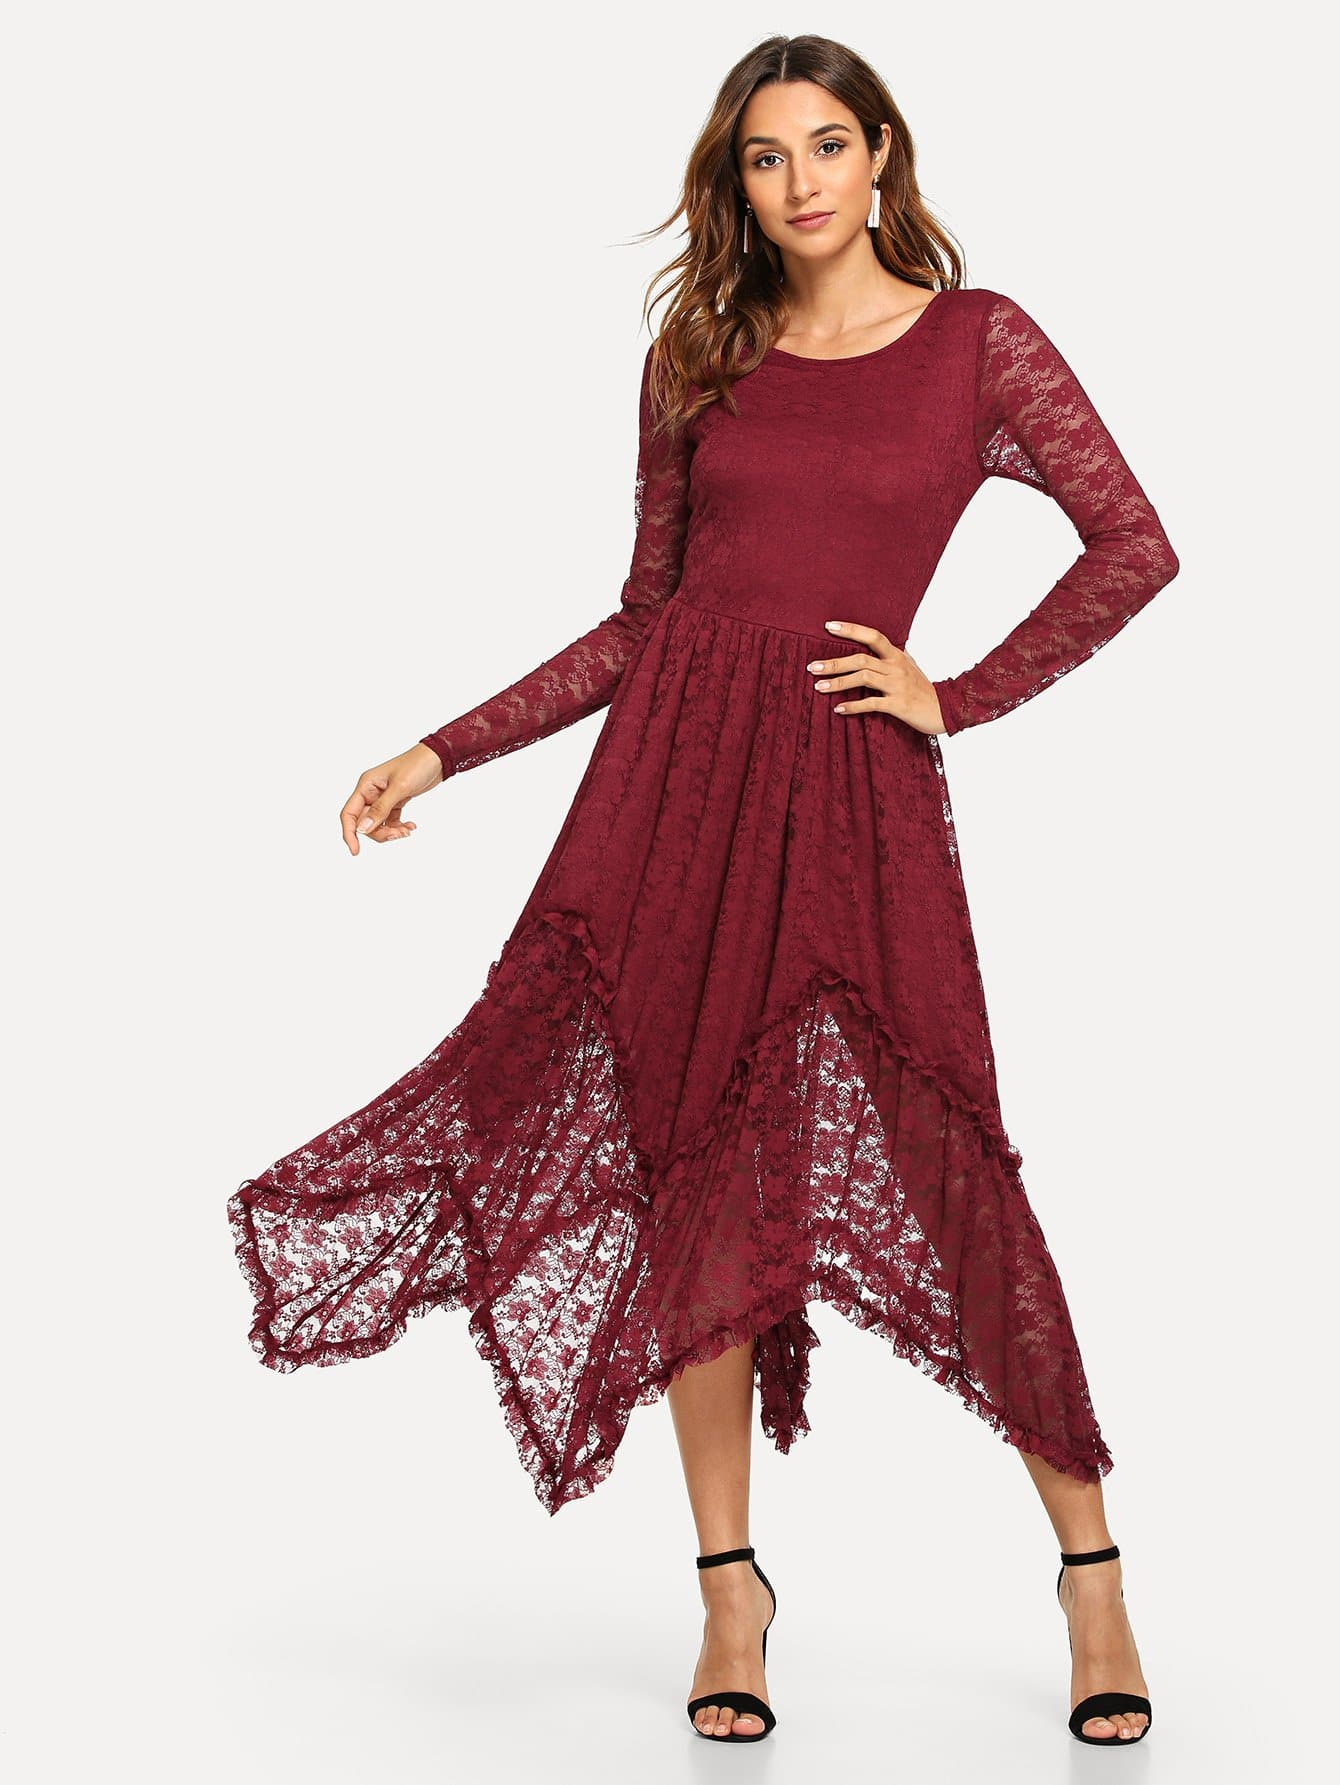 e436cdc620 Lace Detail Long Sleeve Dress EmmaCloth-Women Fast Fashion Online